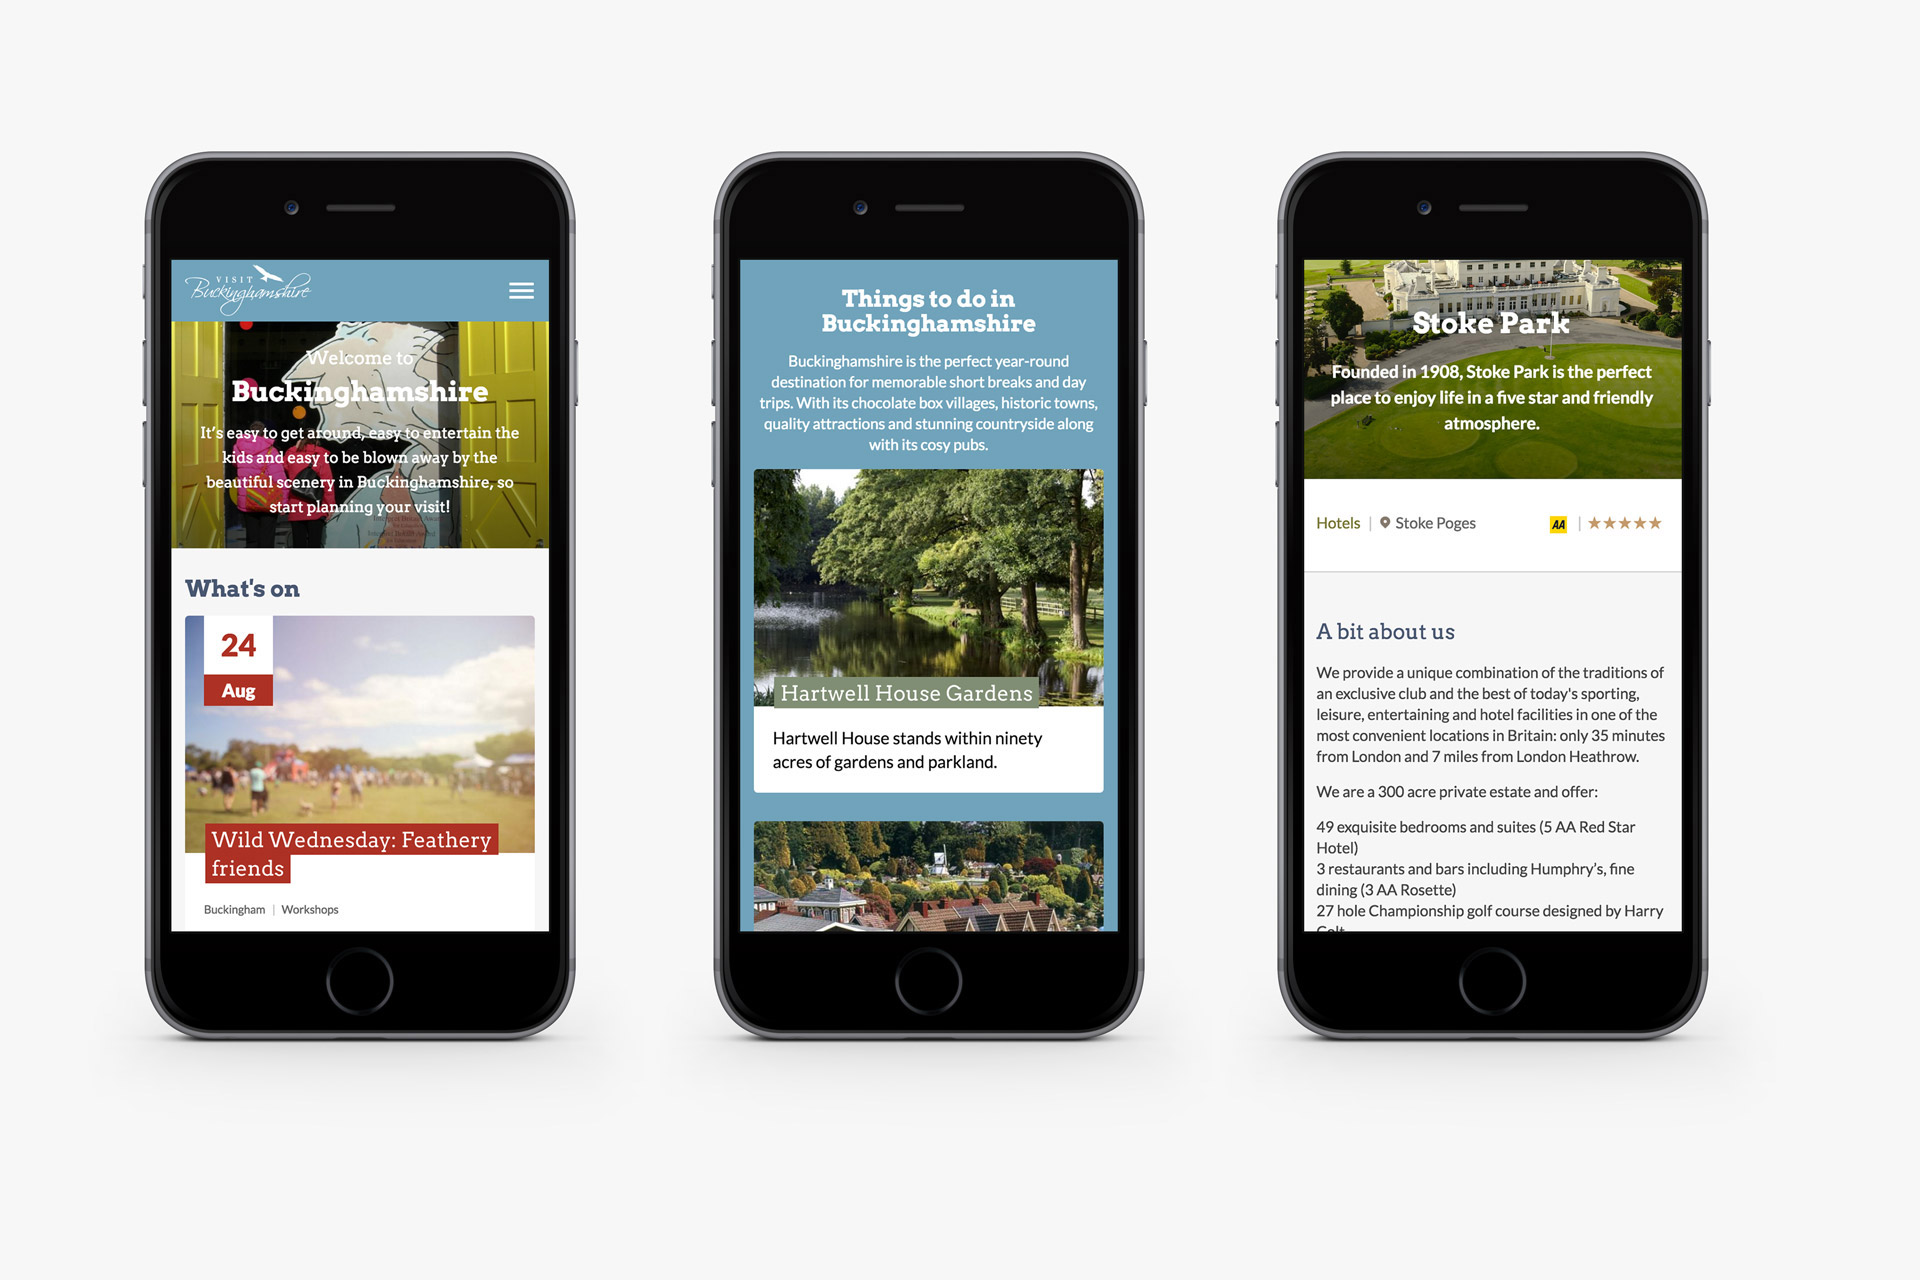 Visit-Buckinghamshire-website-mobile-phone-furthermore.jpg